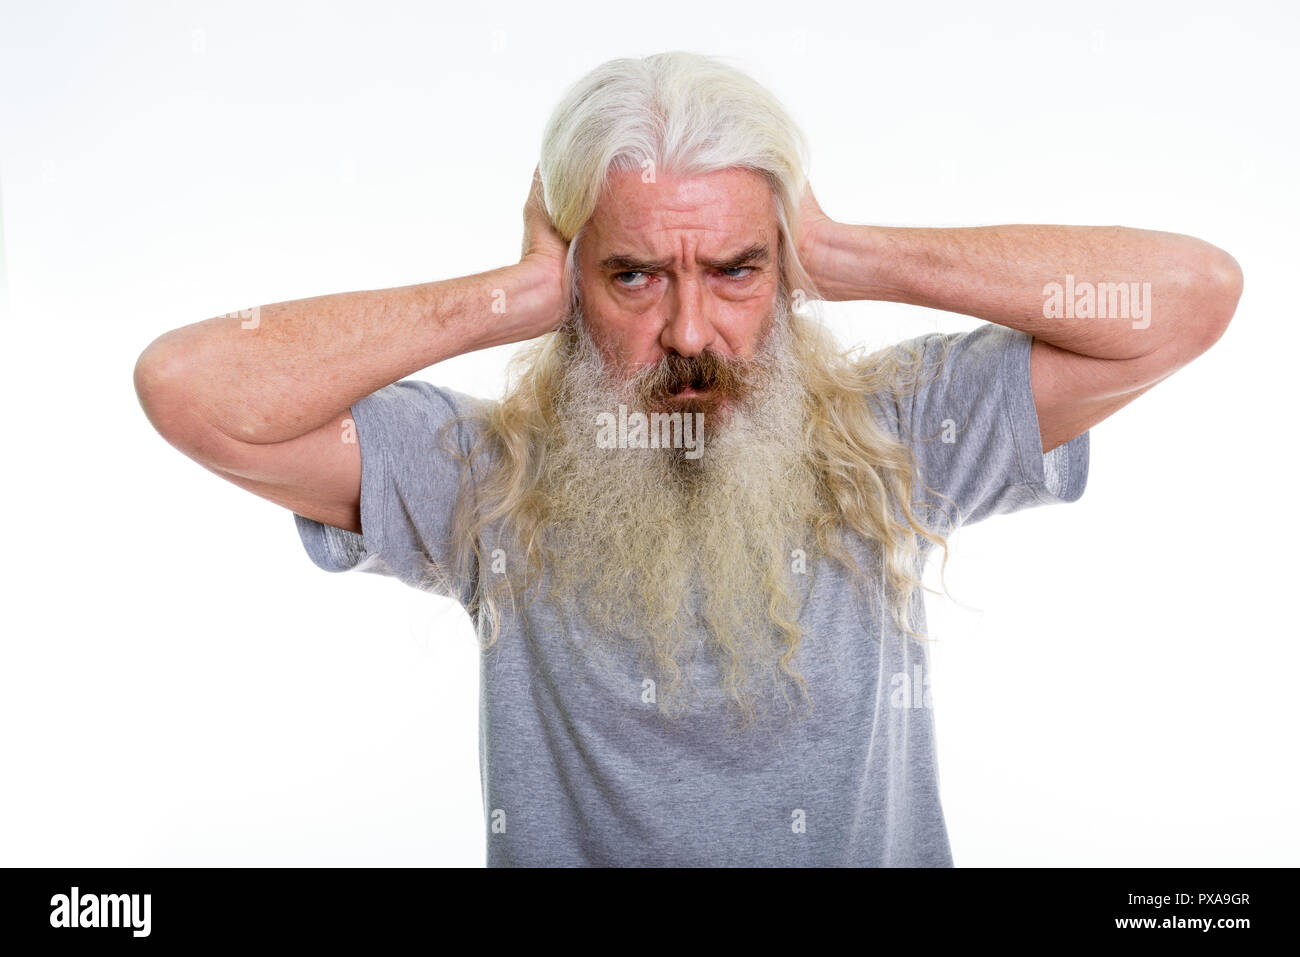 Studio shot of senior bearded man thinking while covering ears  - Stock Image